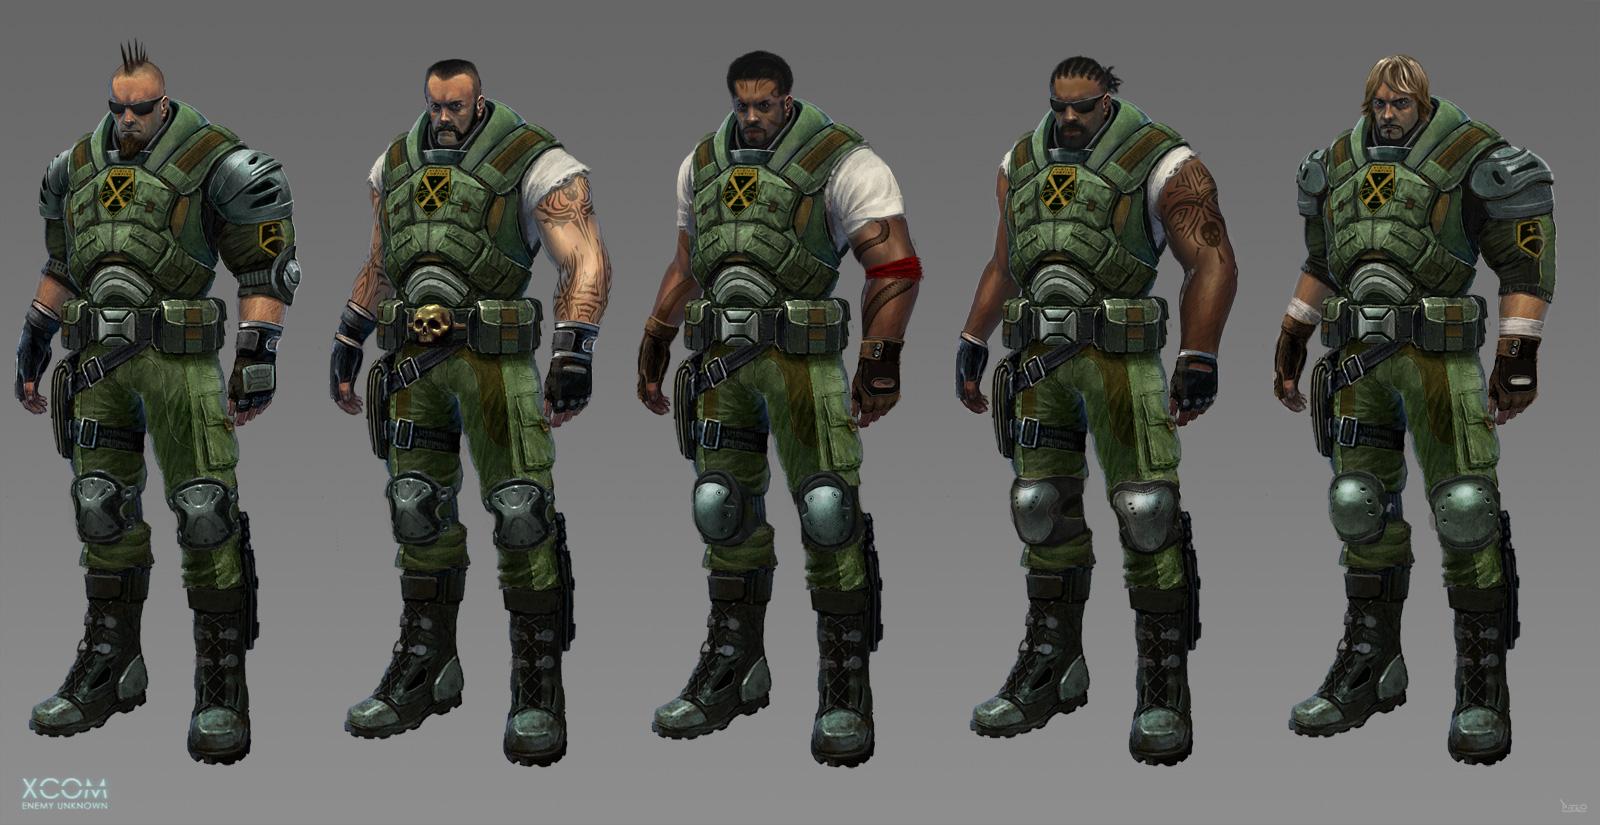 piero macgowan - blog: xcom soldiers and progression